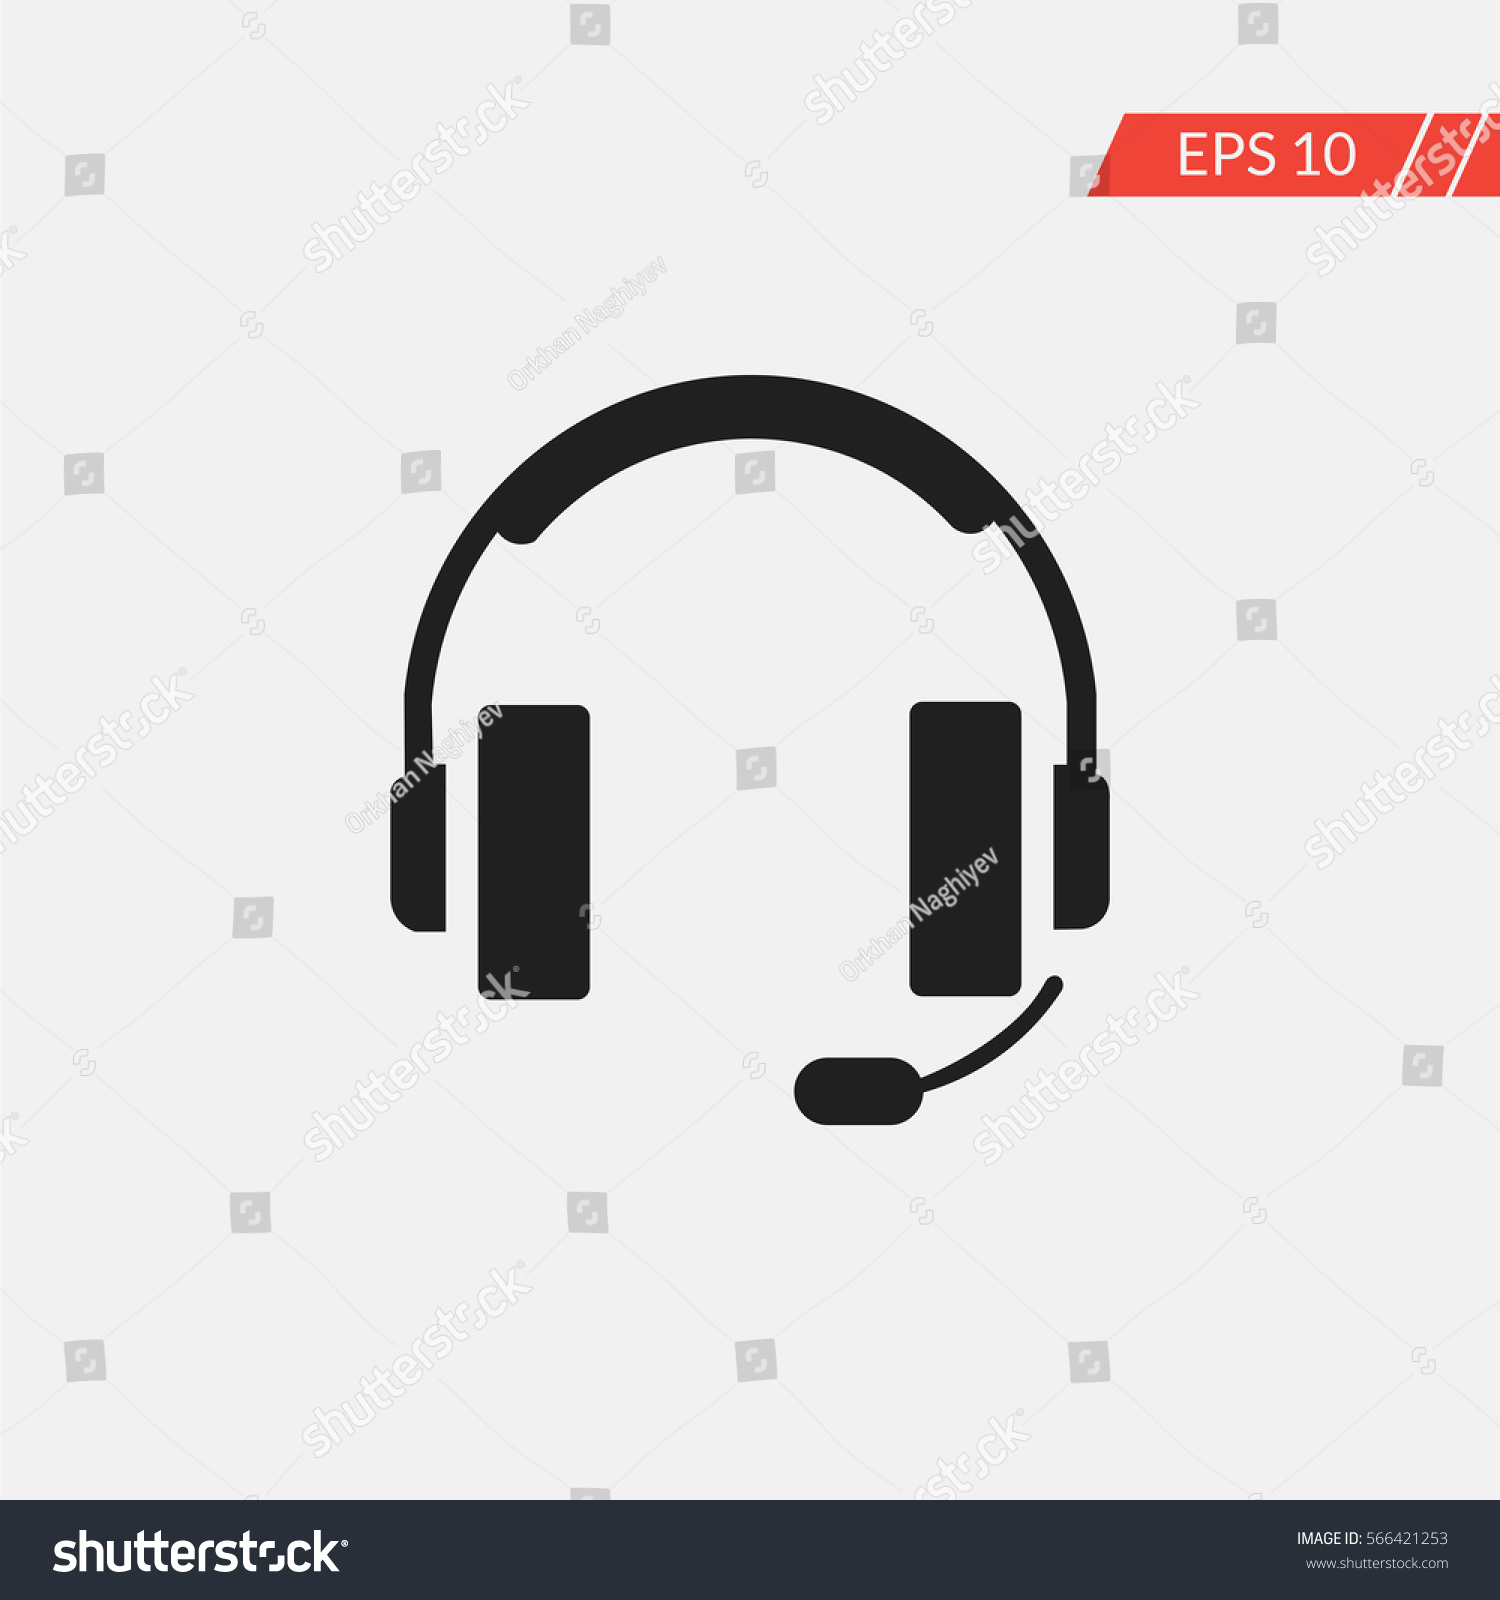 Headset Vector Icon Stock-Vektorgrafik (Lizenzfrei) 566421253 ...